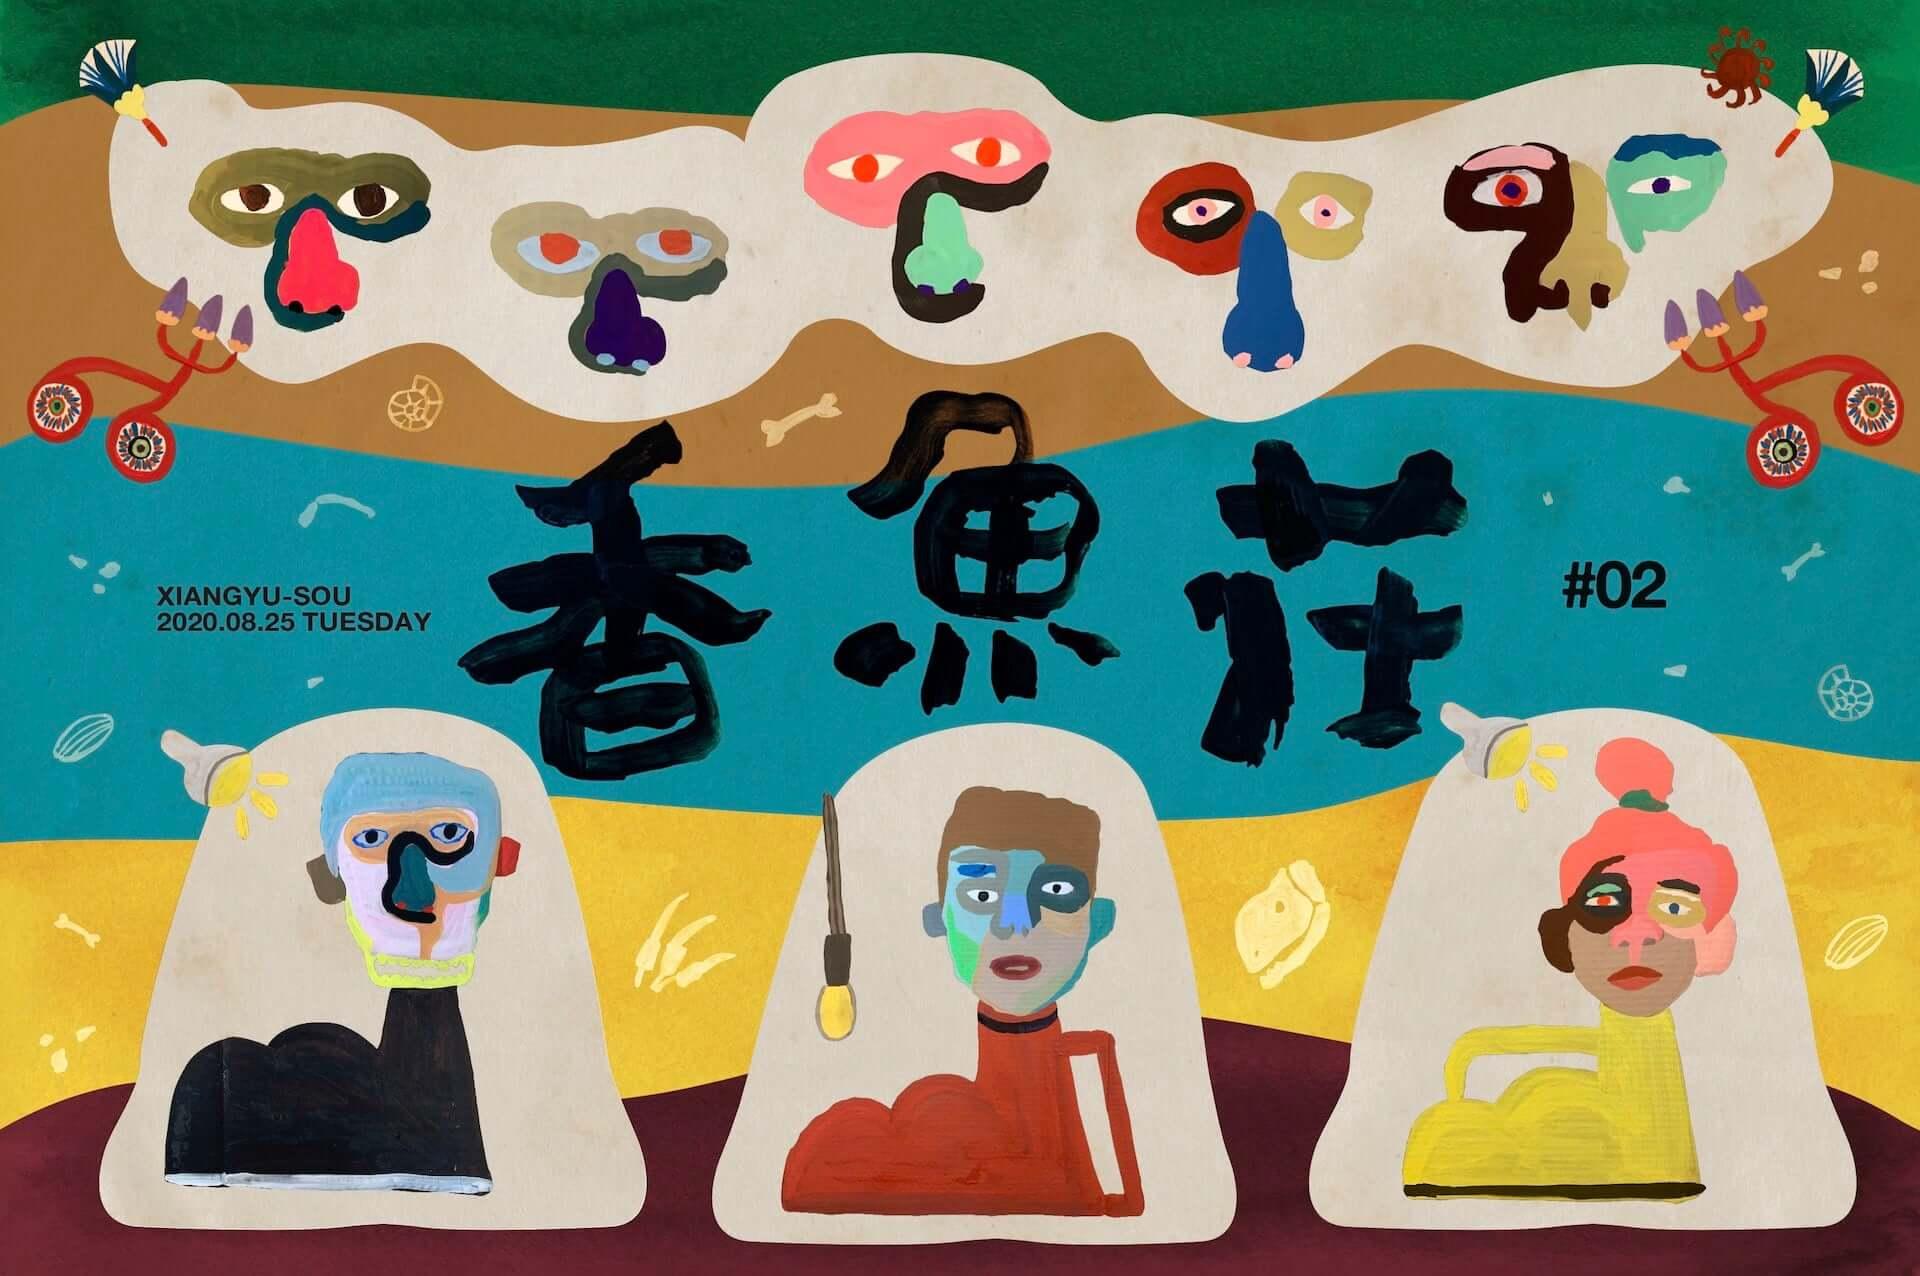 xiangyuの自主企画<香魚荘#02>にTaigen Kawabeのソロプロジェクト・Ill Japoniaが出演決定!公開ミーティングは今夜開催 music200819_xiangyu_3-1920x1276